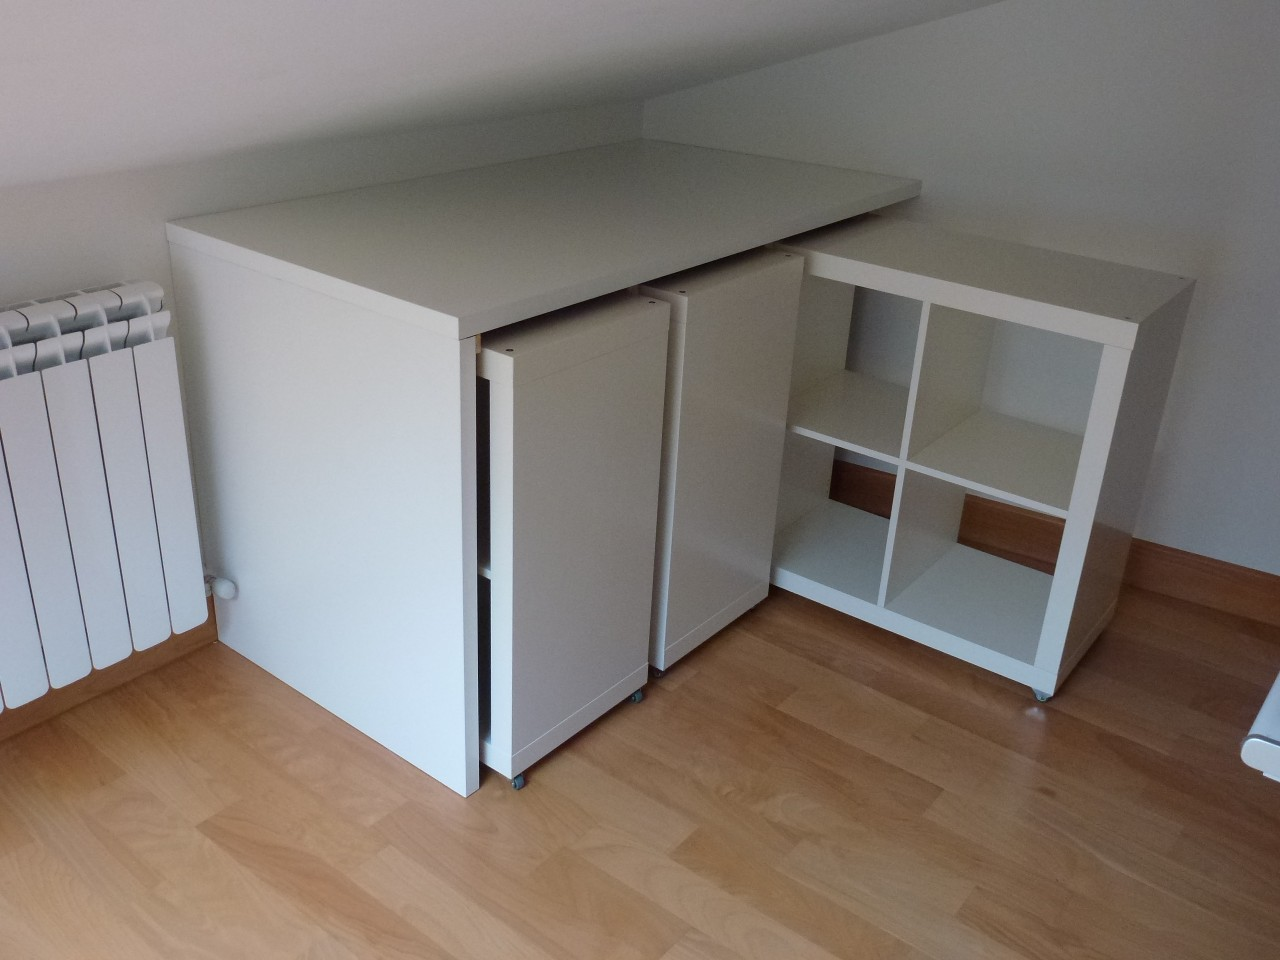 ikea schreibtisch regal kombination. Black Bedroom Furniture Sets. Home Design Ideas